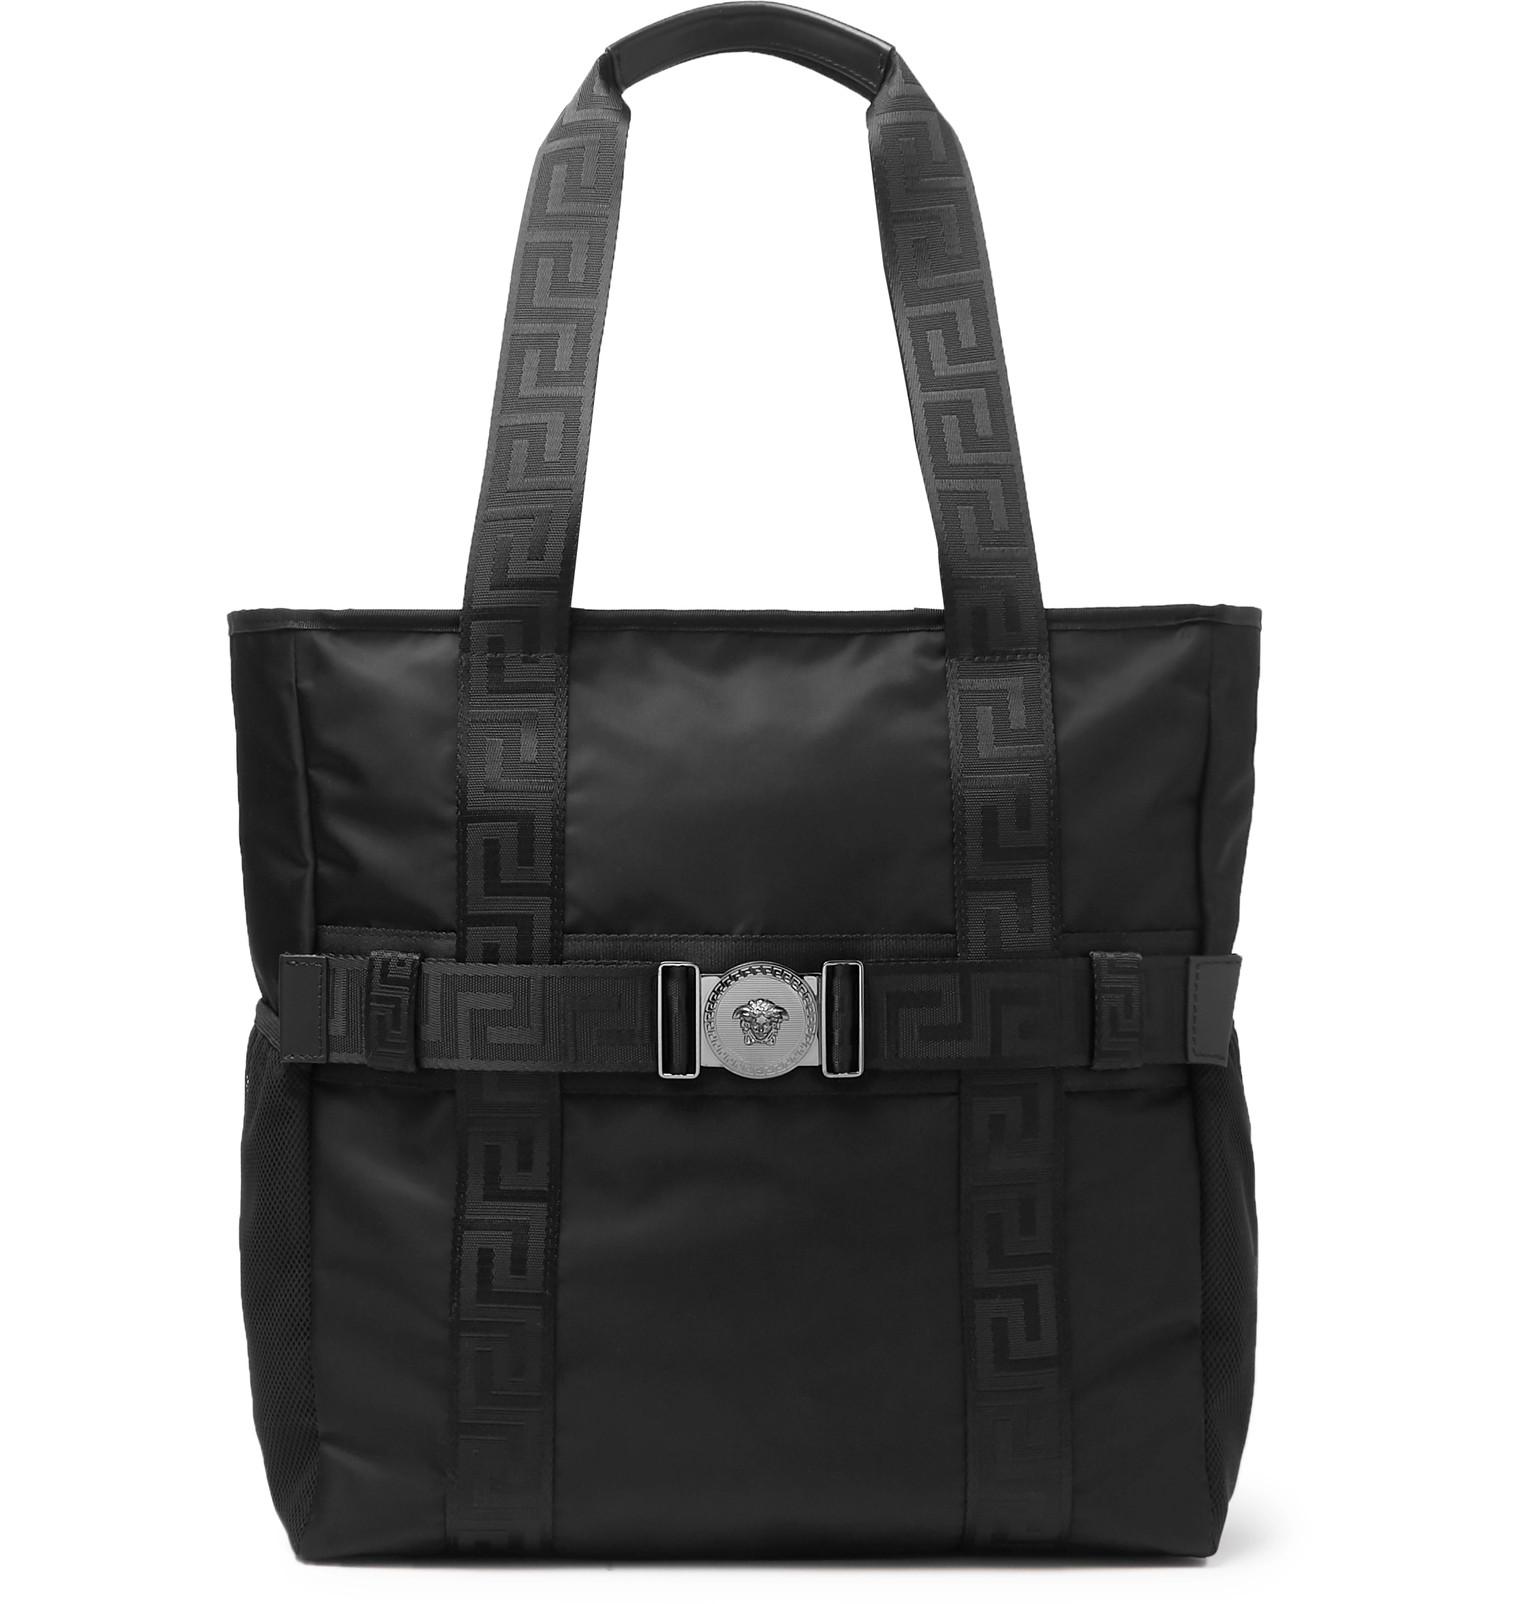 cc58fbded8eb Versace - Logo-Detailed Nylon Tote Bag